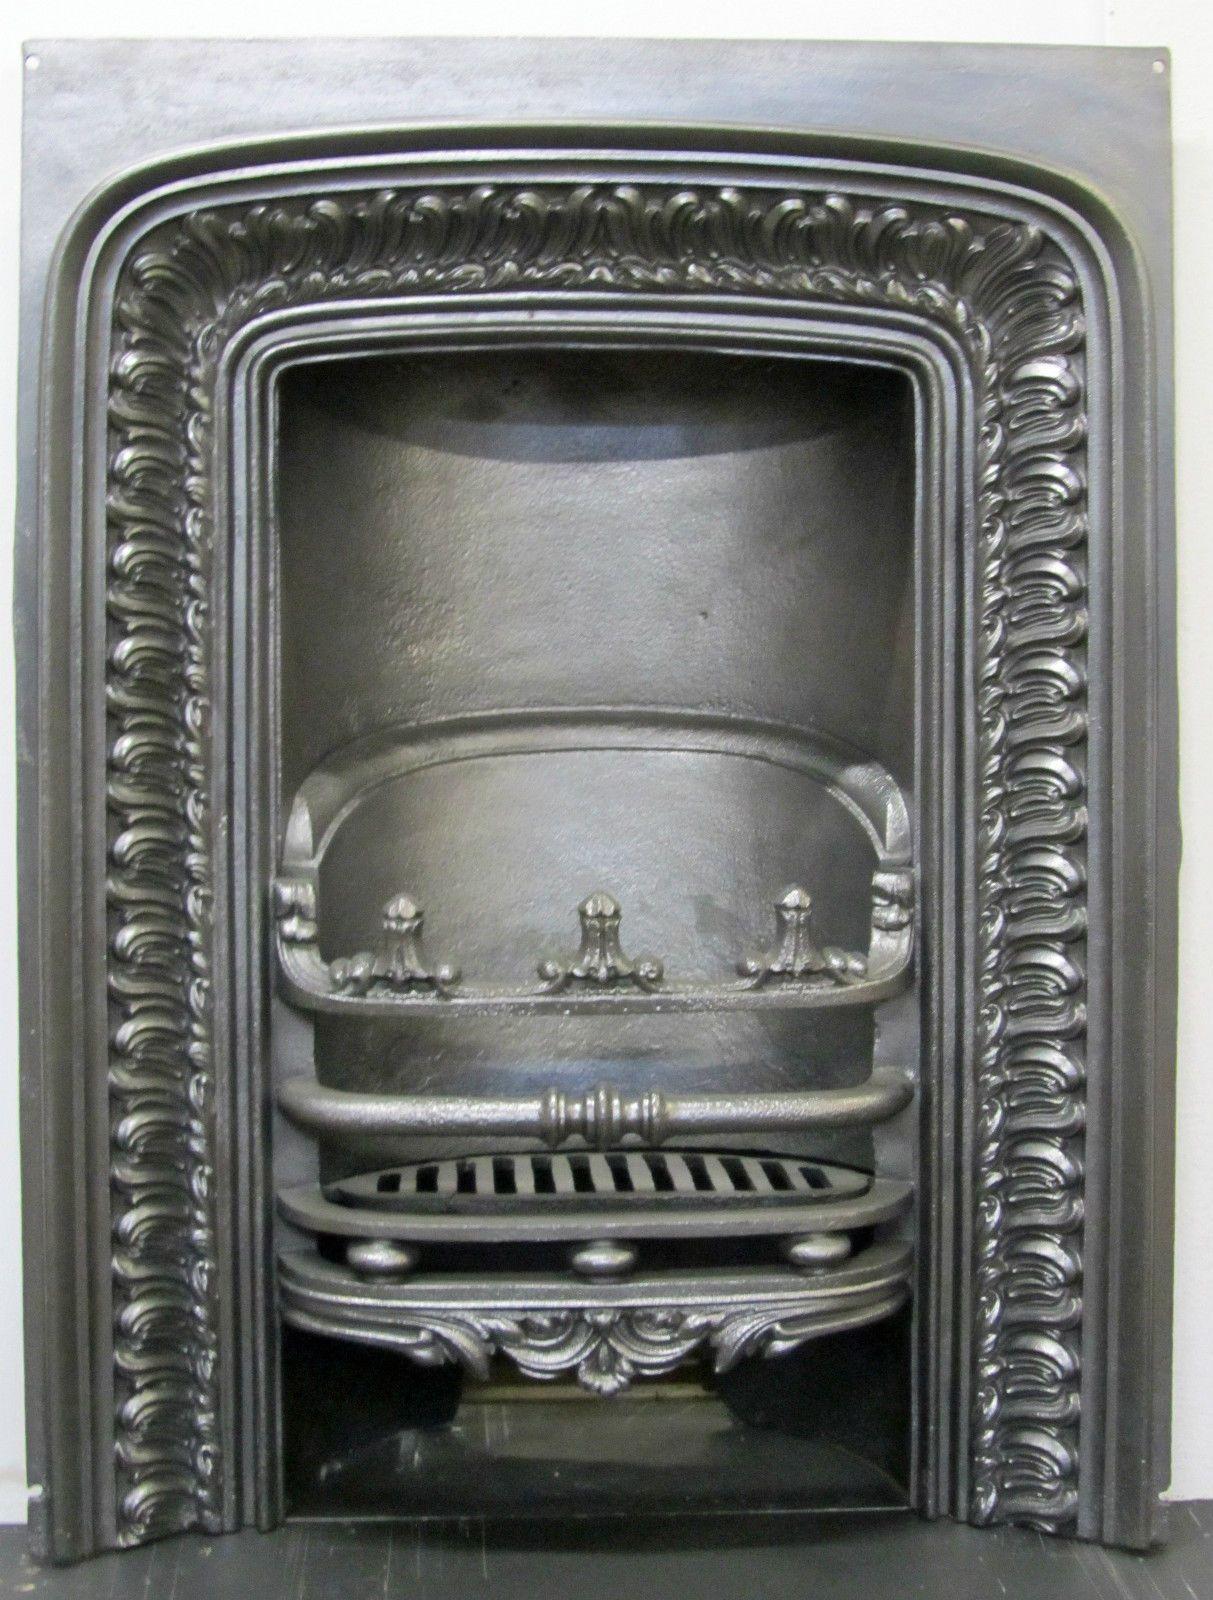 Decorative Antique Victorian Cast Iron Insert Fireplace Antique Fireplace Surround Antique Fireplace